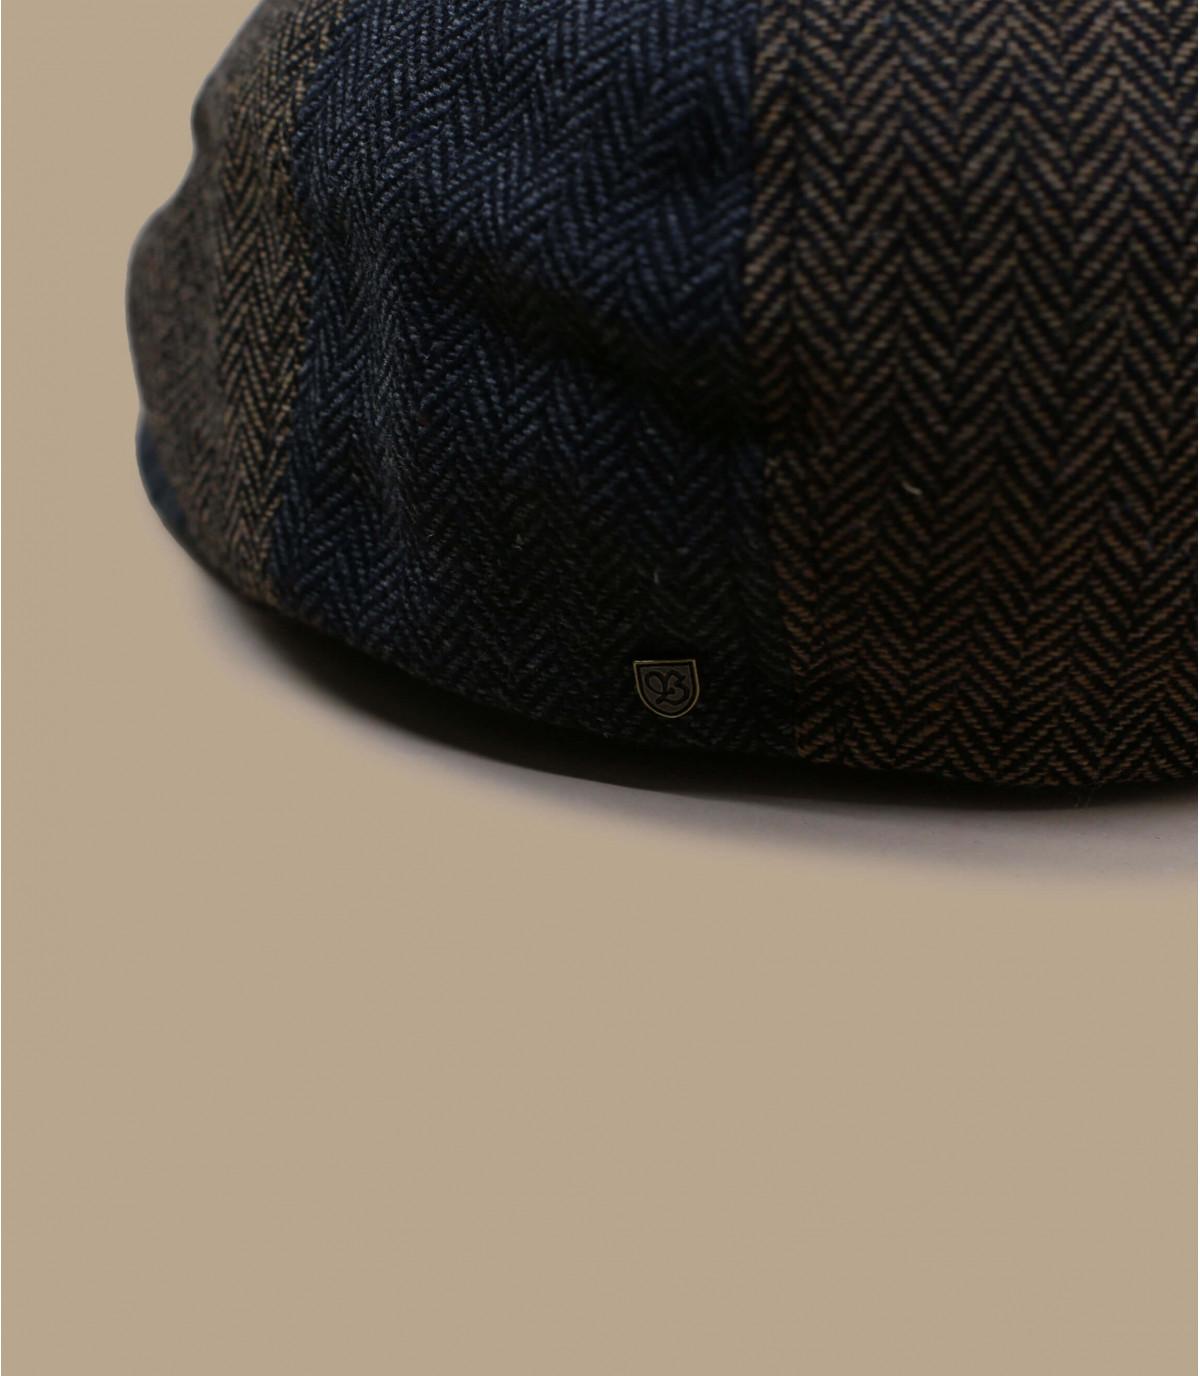 Details Brood brown grey - Abbildung 2